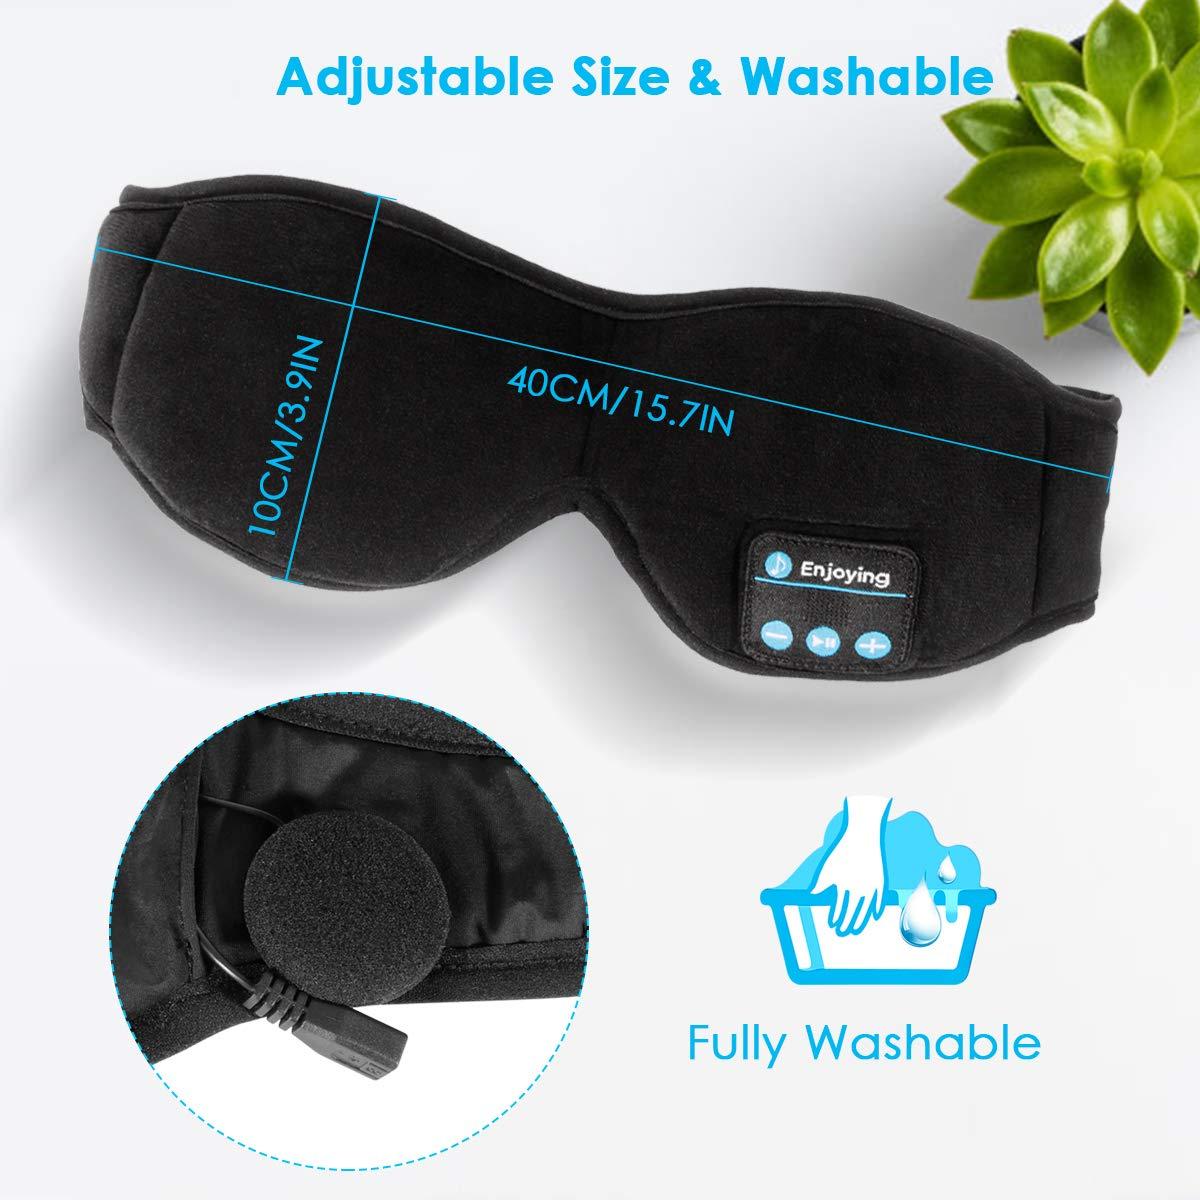 WU-MINGLU Upgraded Bluetooth Eye Mask Sleep Headphones, Wireless Music Silk Eye Cover Sleeping Mask Headphones Built -in Speakers Microphone Handsfree Adjustable and Washable